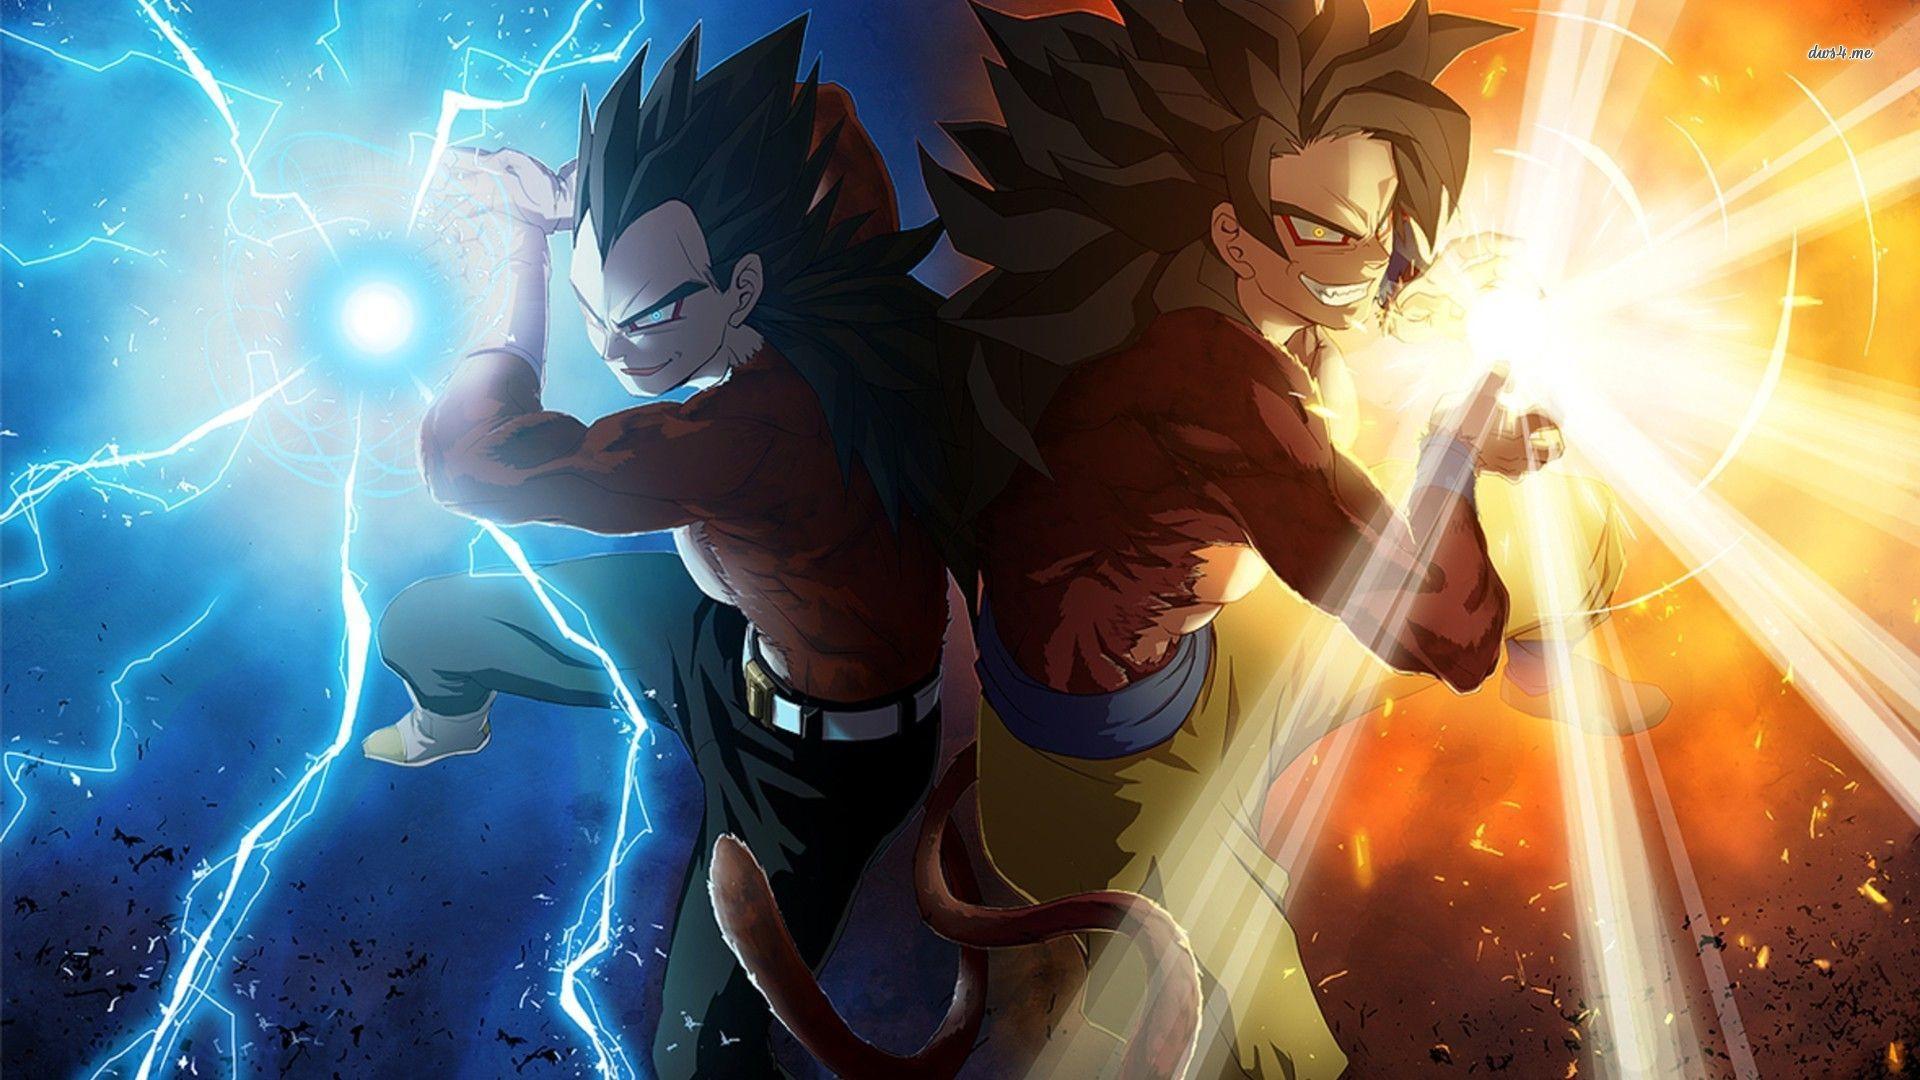 HD Super Saiyan 4 Vegeta and Goku Wallpaper Full HD .